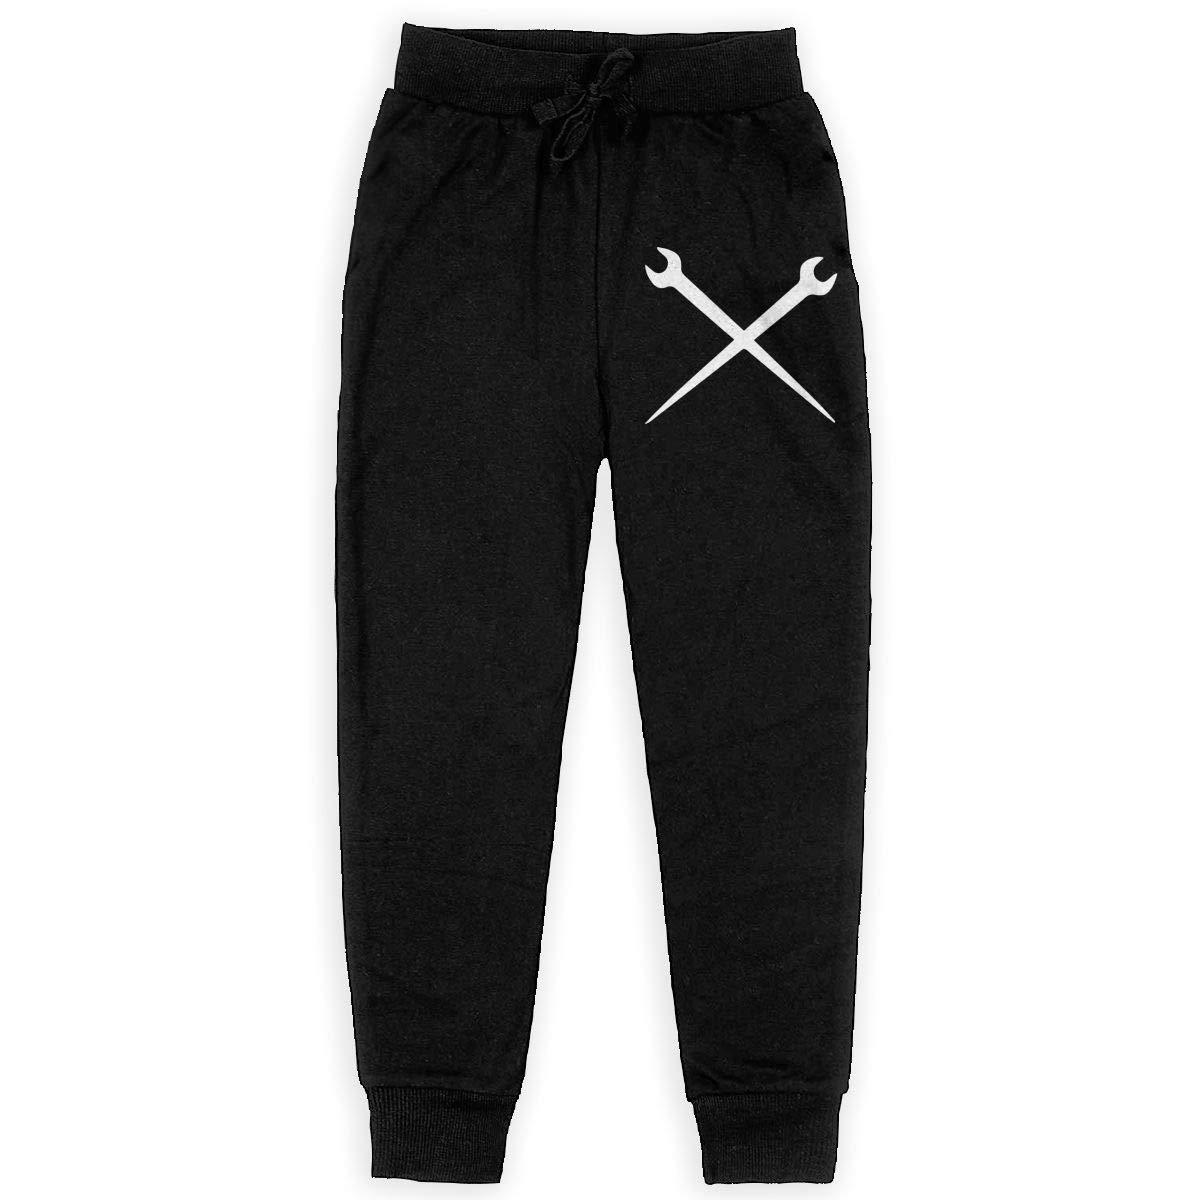 MAOYI/&J6 Ironworker Crossed Tools-1 Long Sweatpants Youth Boys Girls Jogger Pants with Drawstring